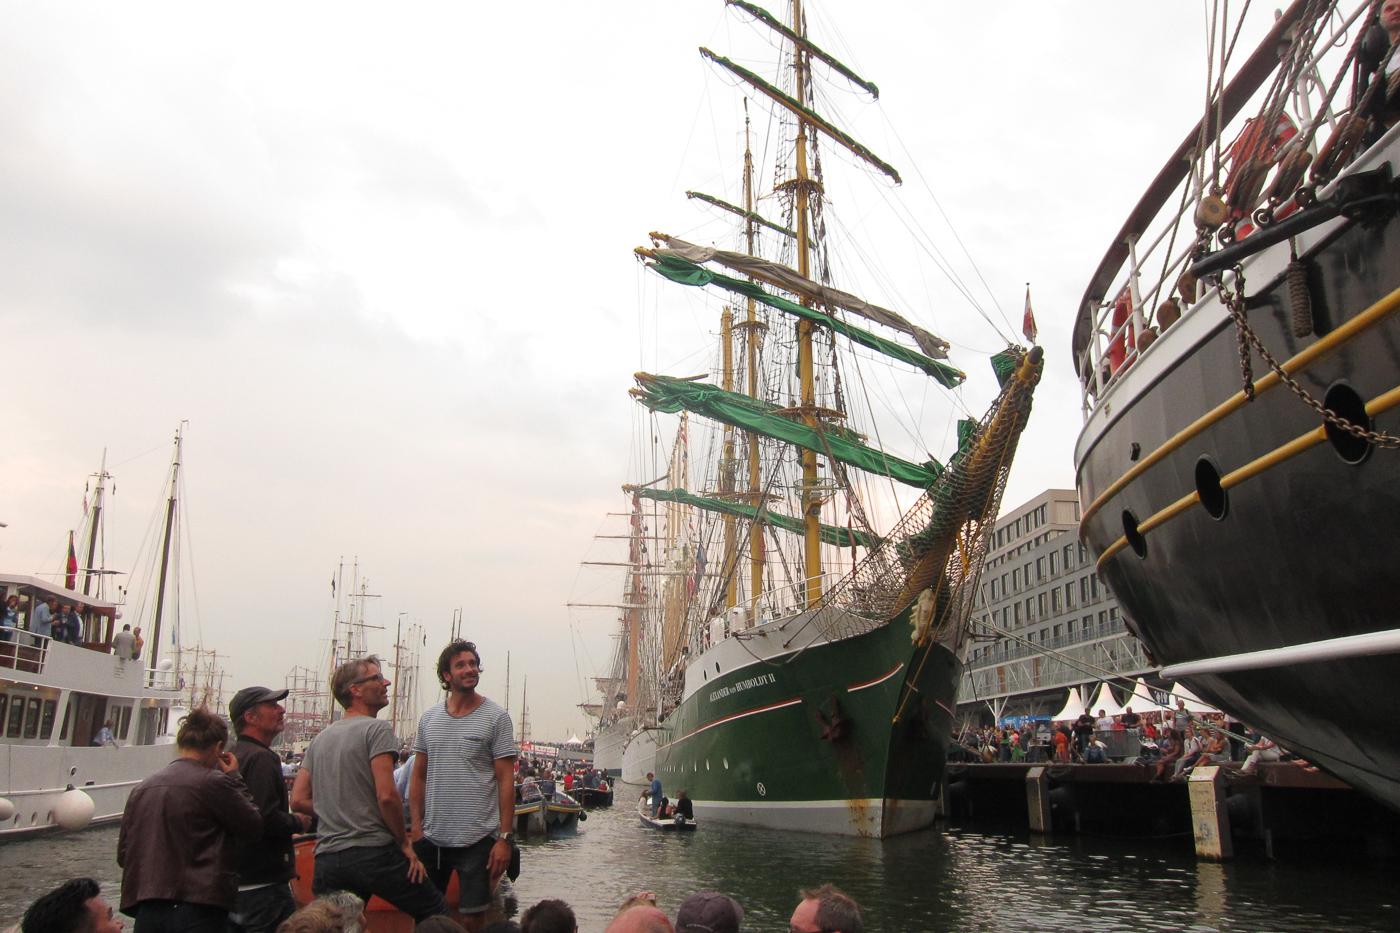 sail lw-6988